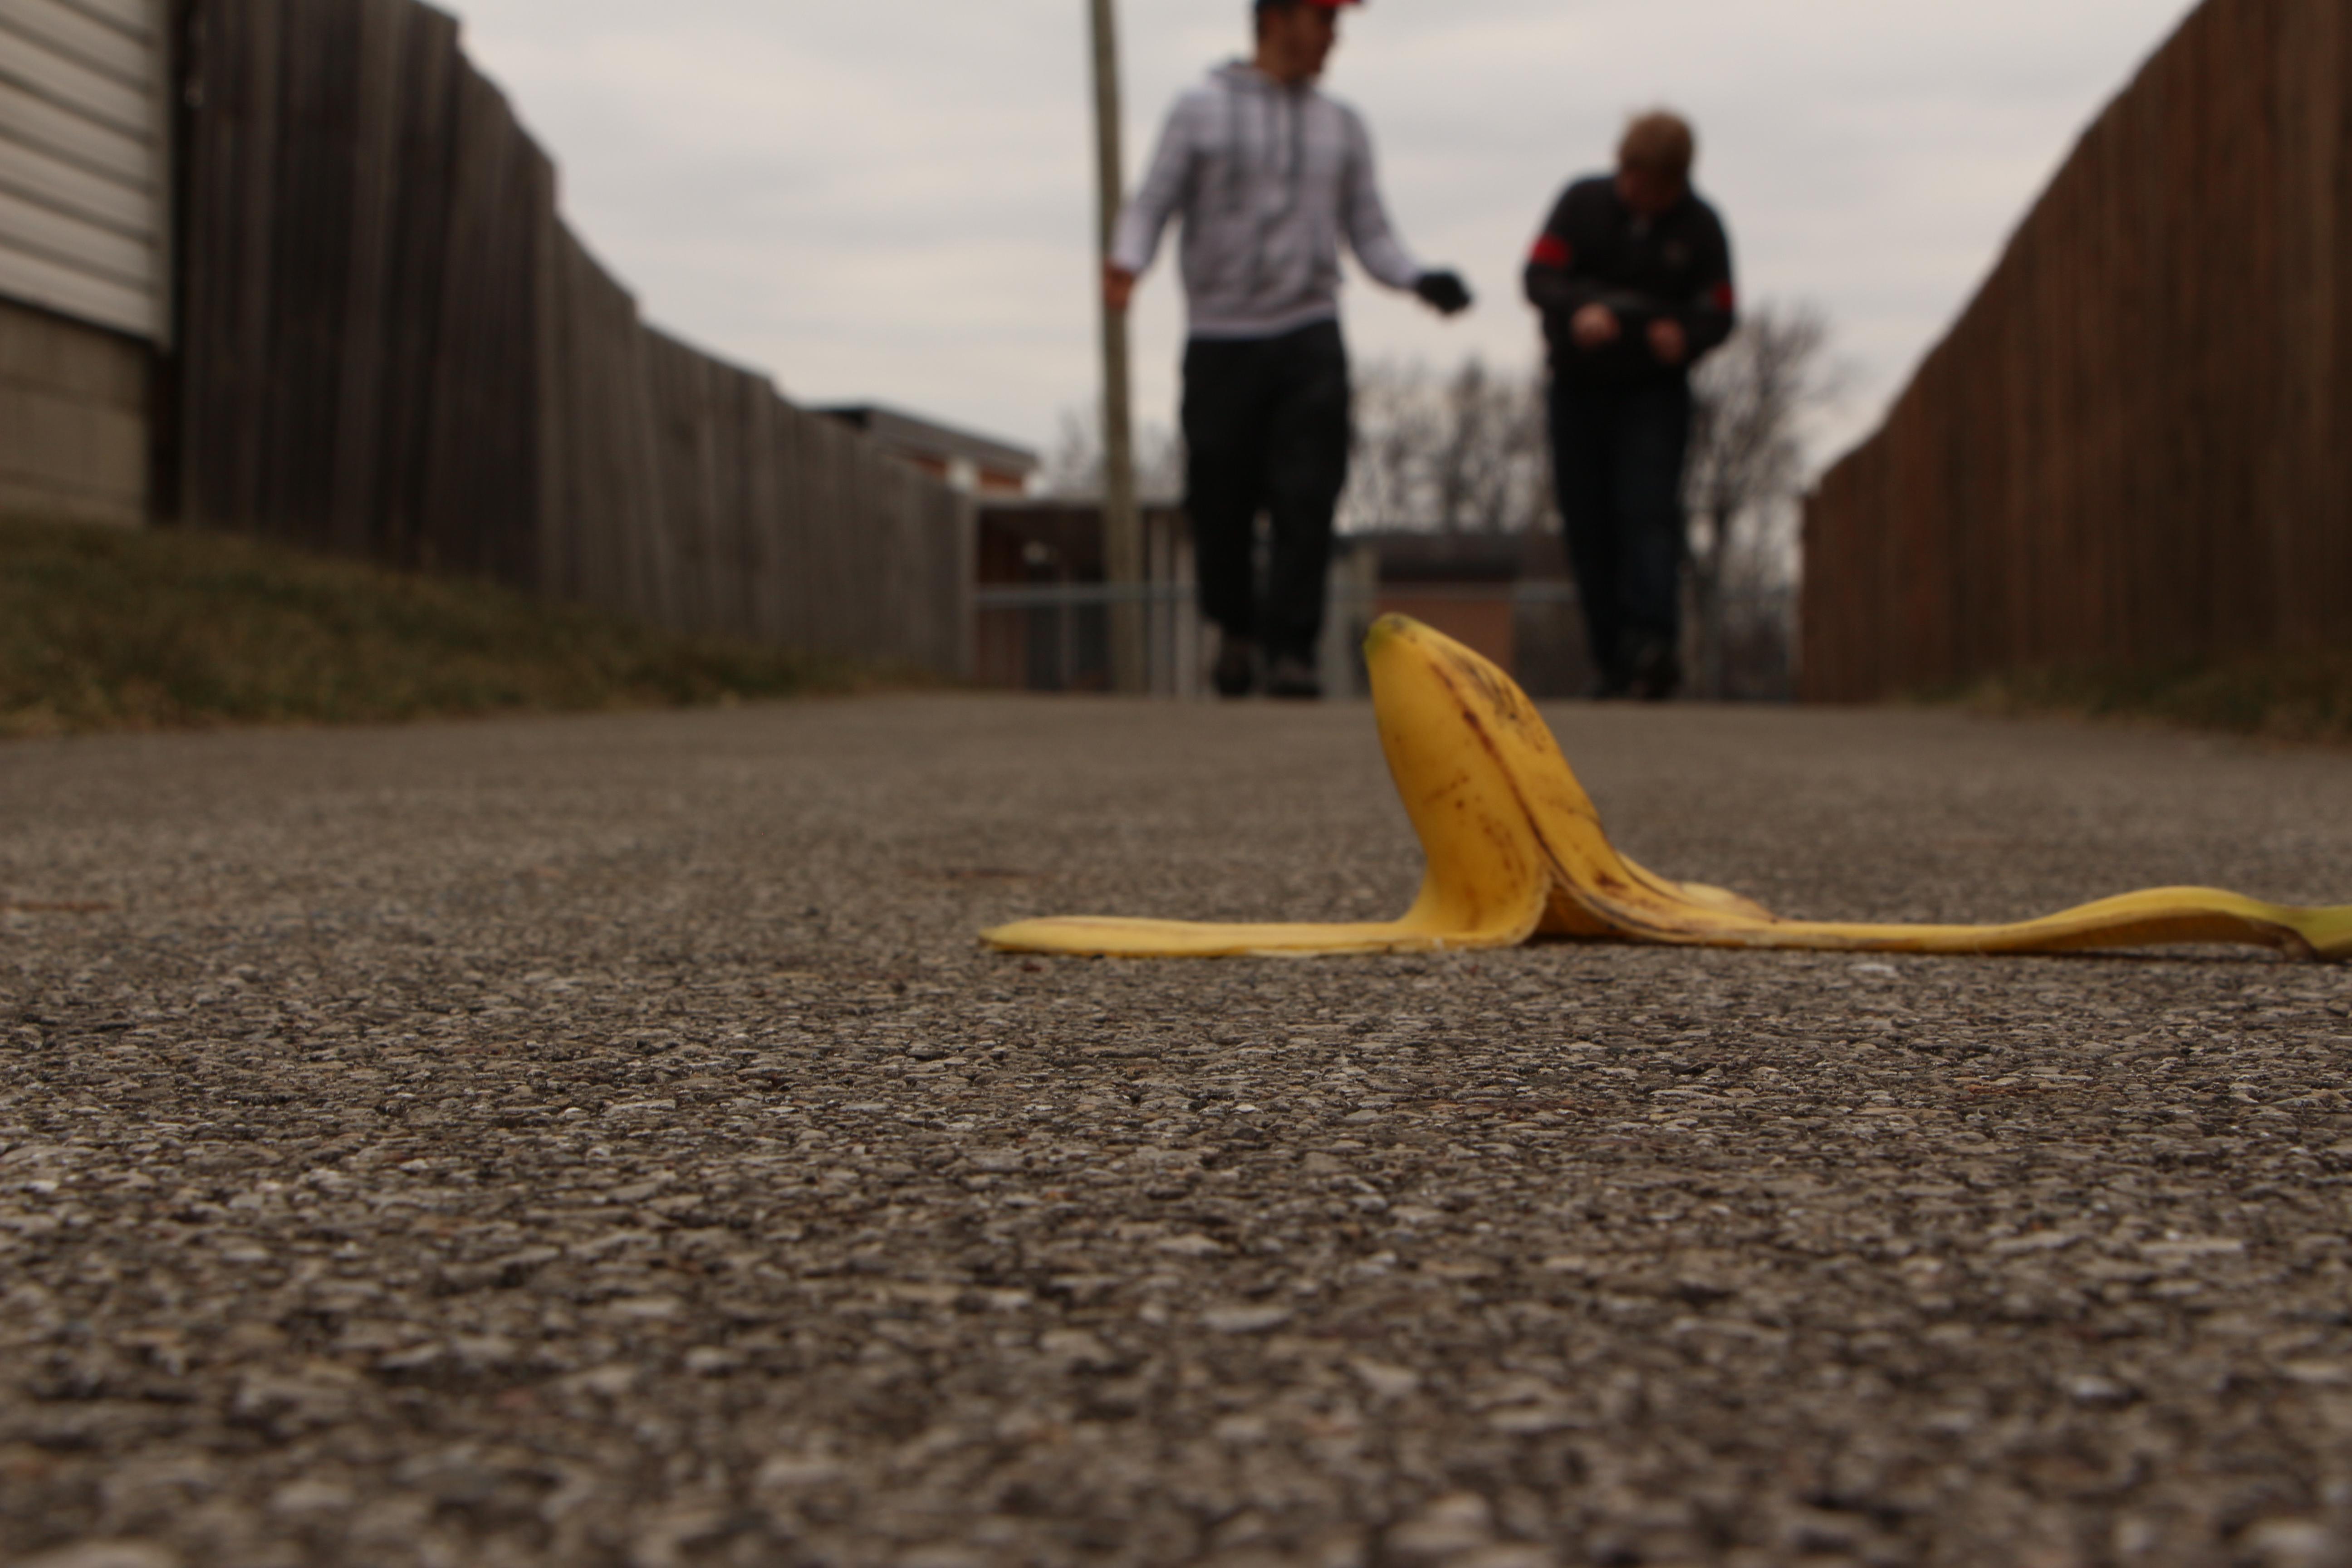 Smoking Banana Peels Gets You High